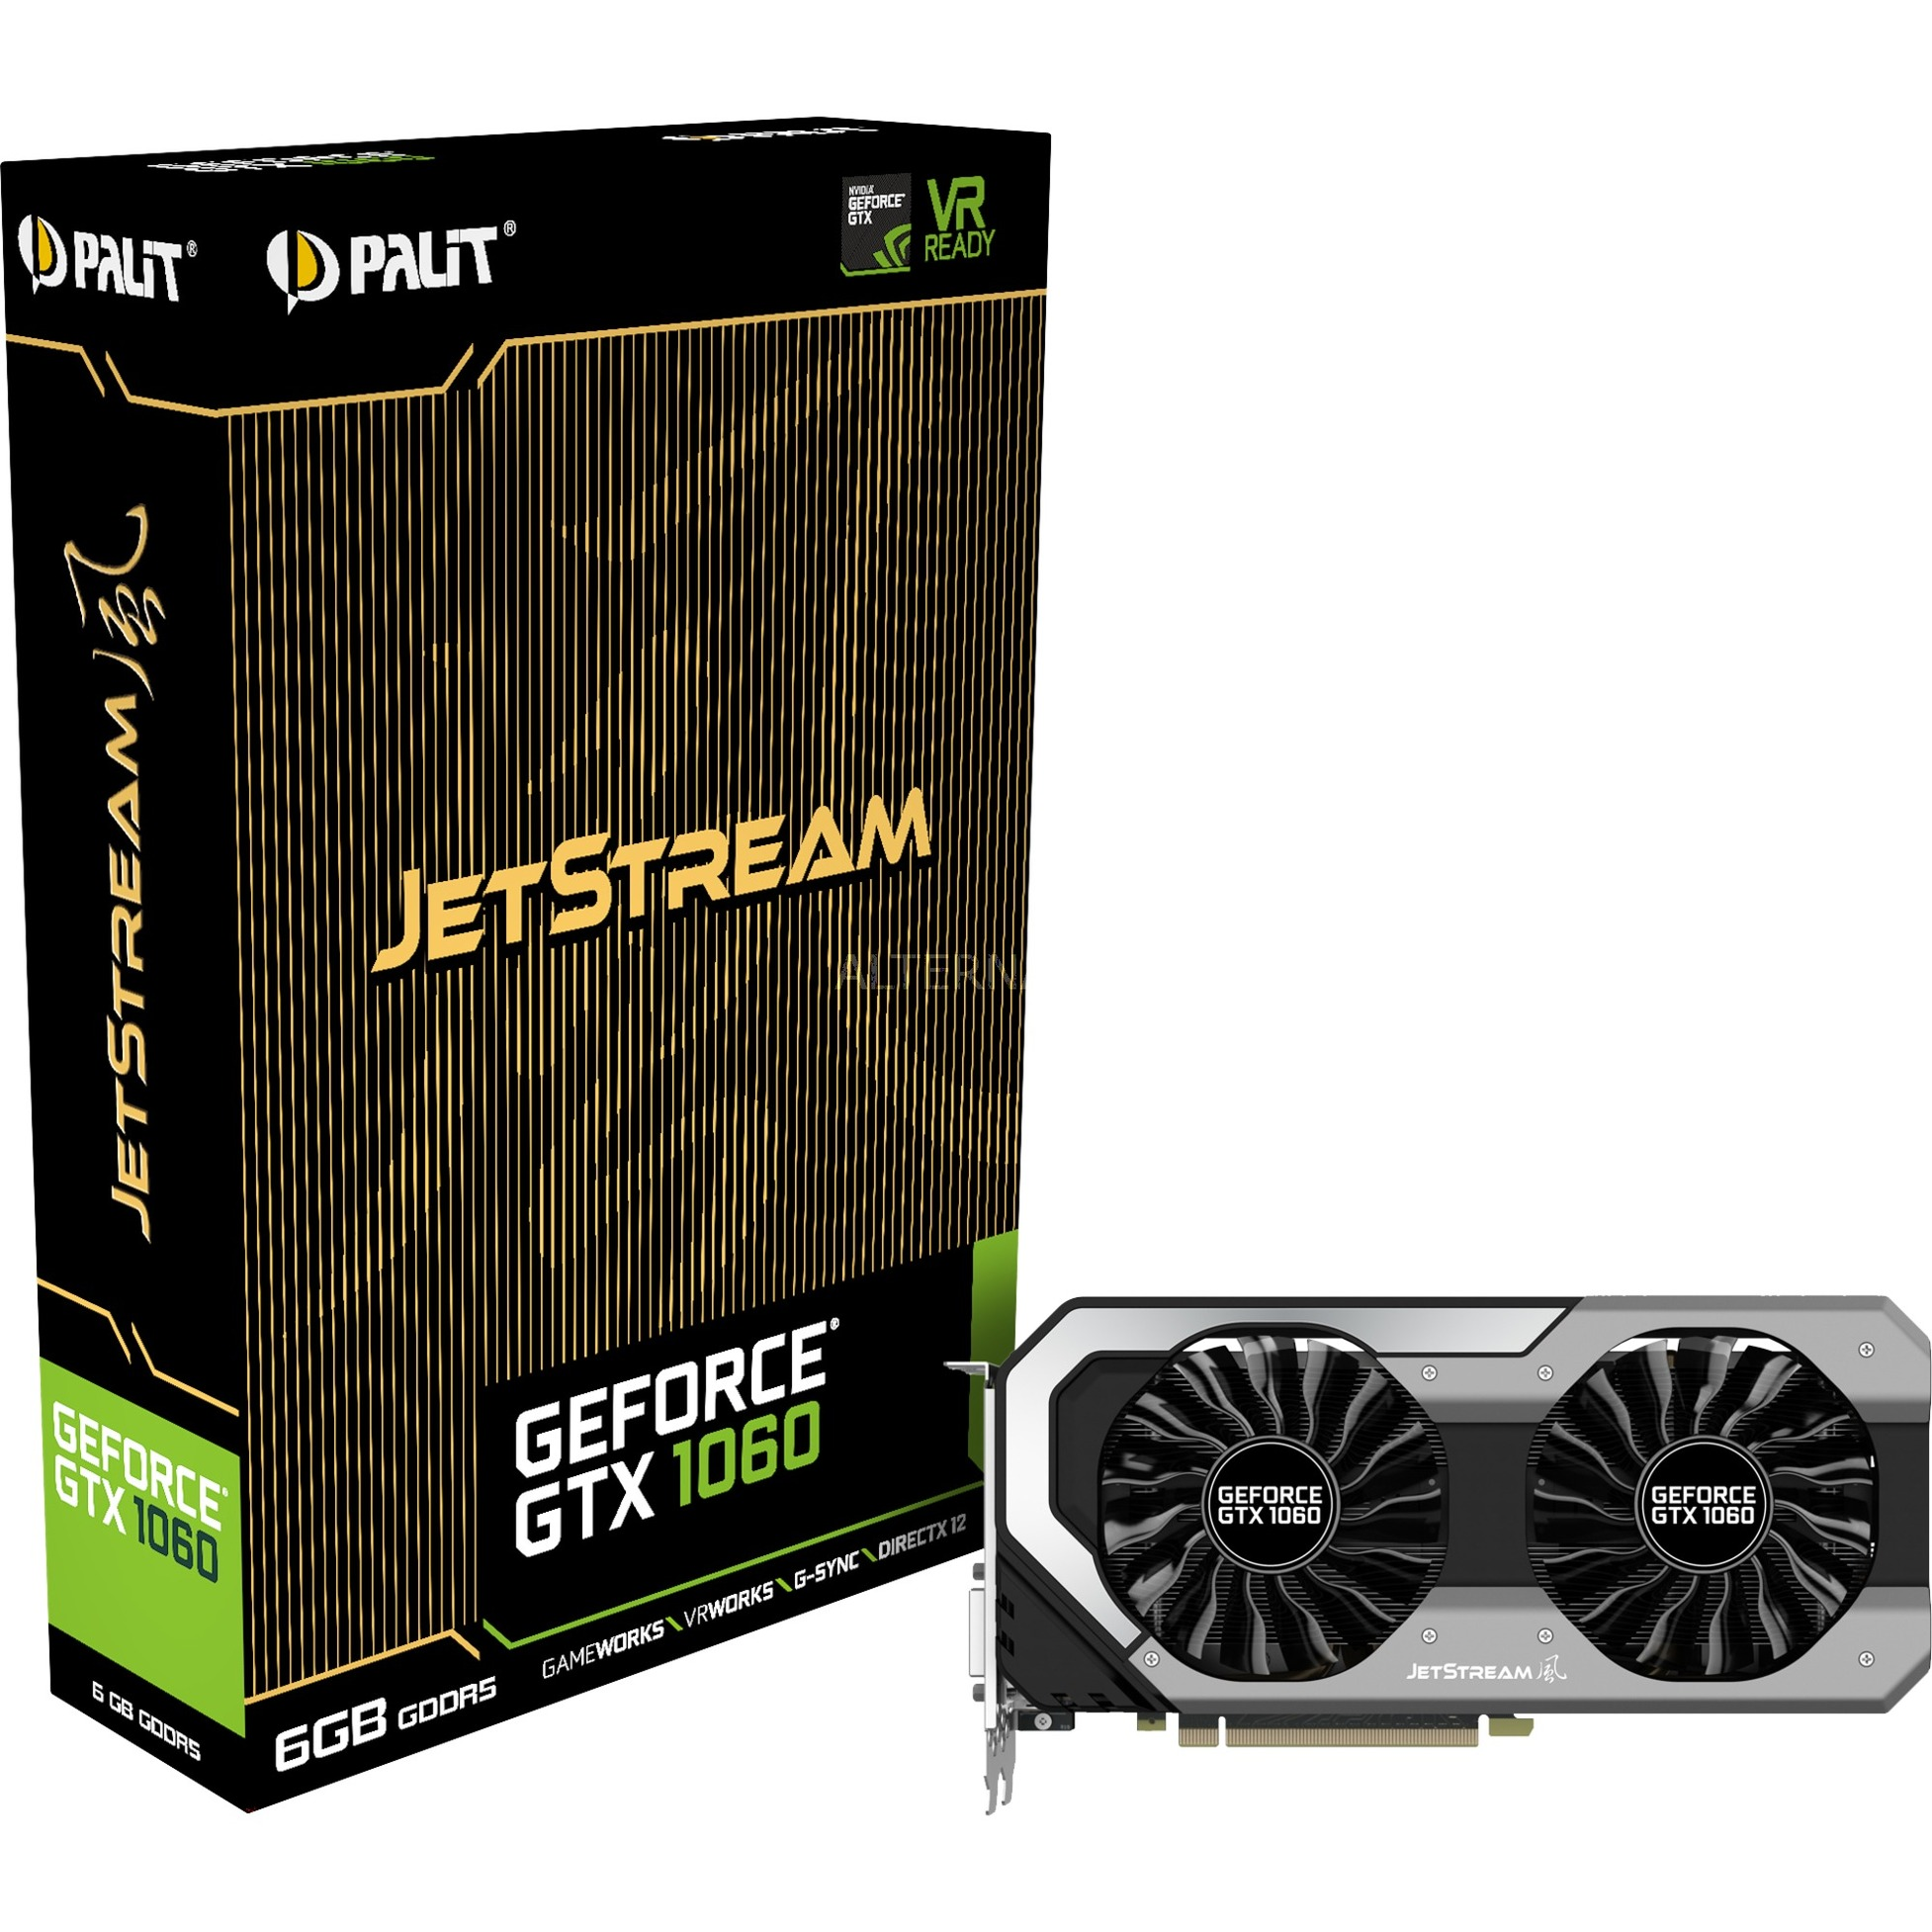 NE51060015J9J GeForce GTX 1060 6GB GDDR5 tarjeta gráfica